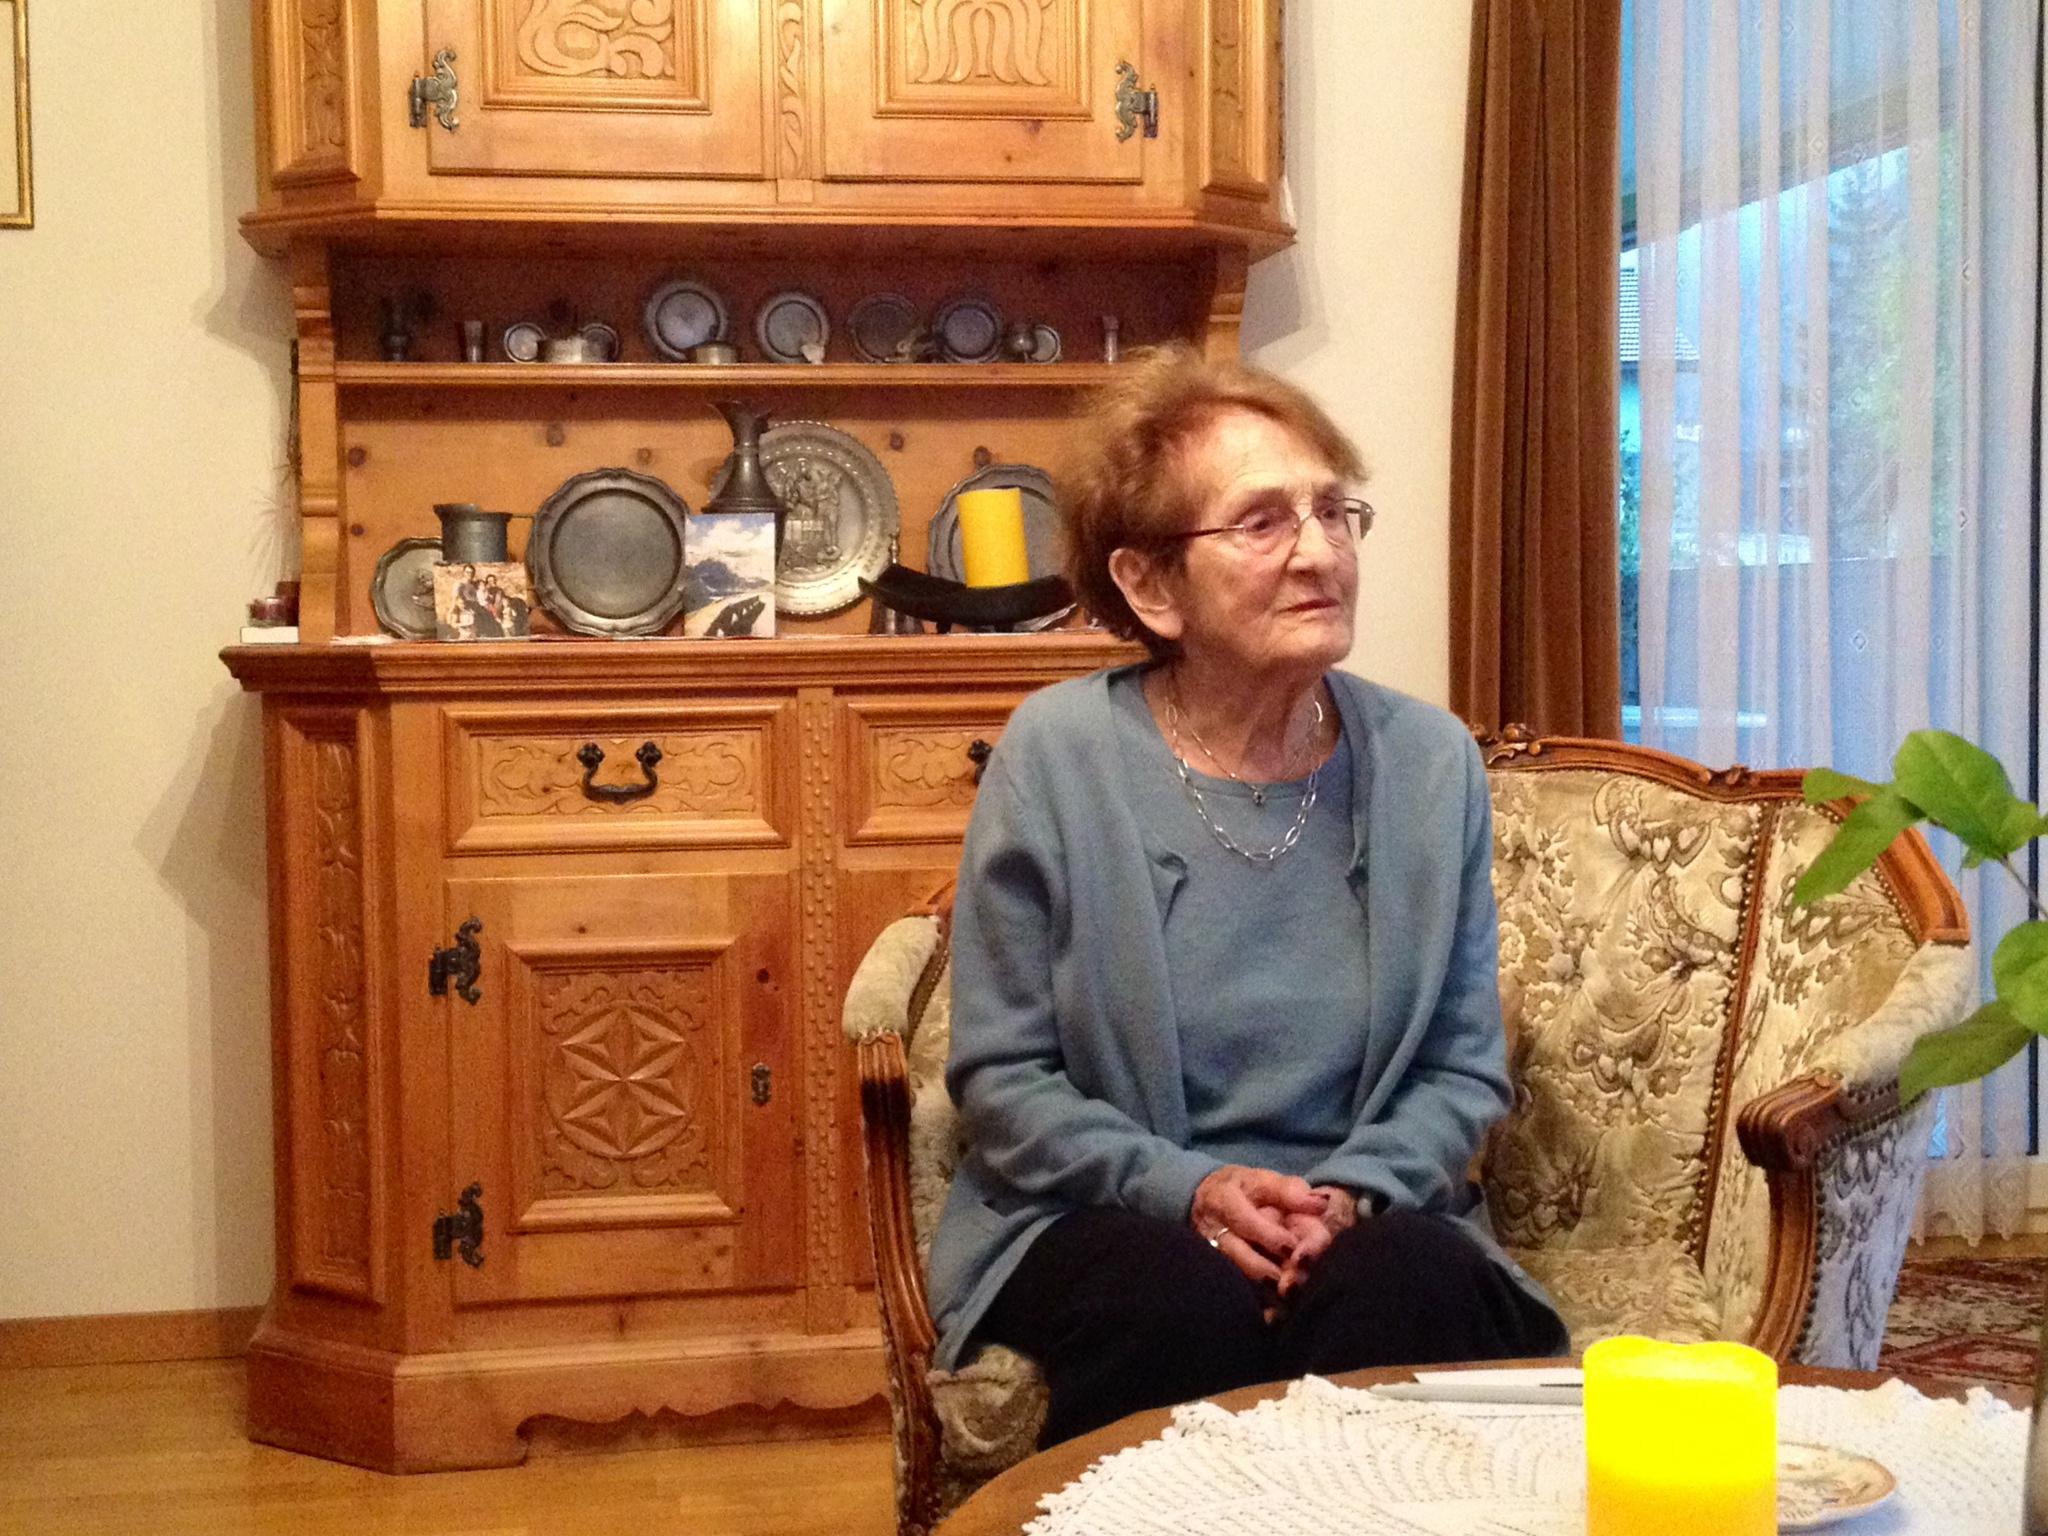 Sabina Bundi ha oz 94 onns. Ella era en il FHD dal 1938 fin l'onn 1946.